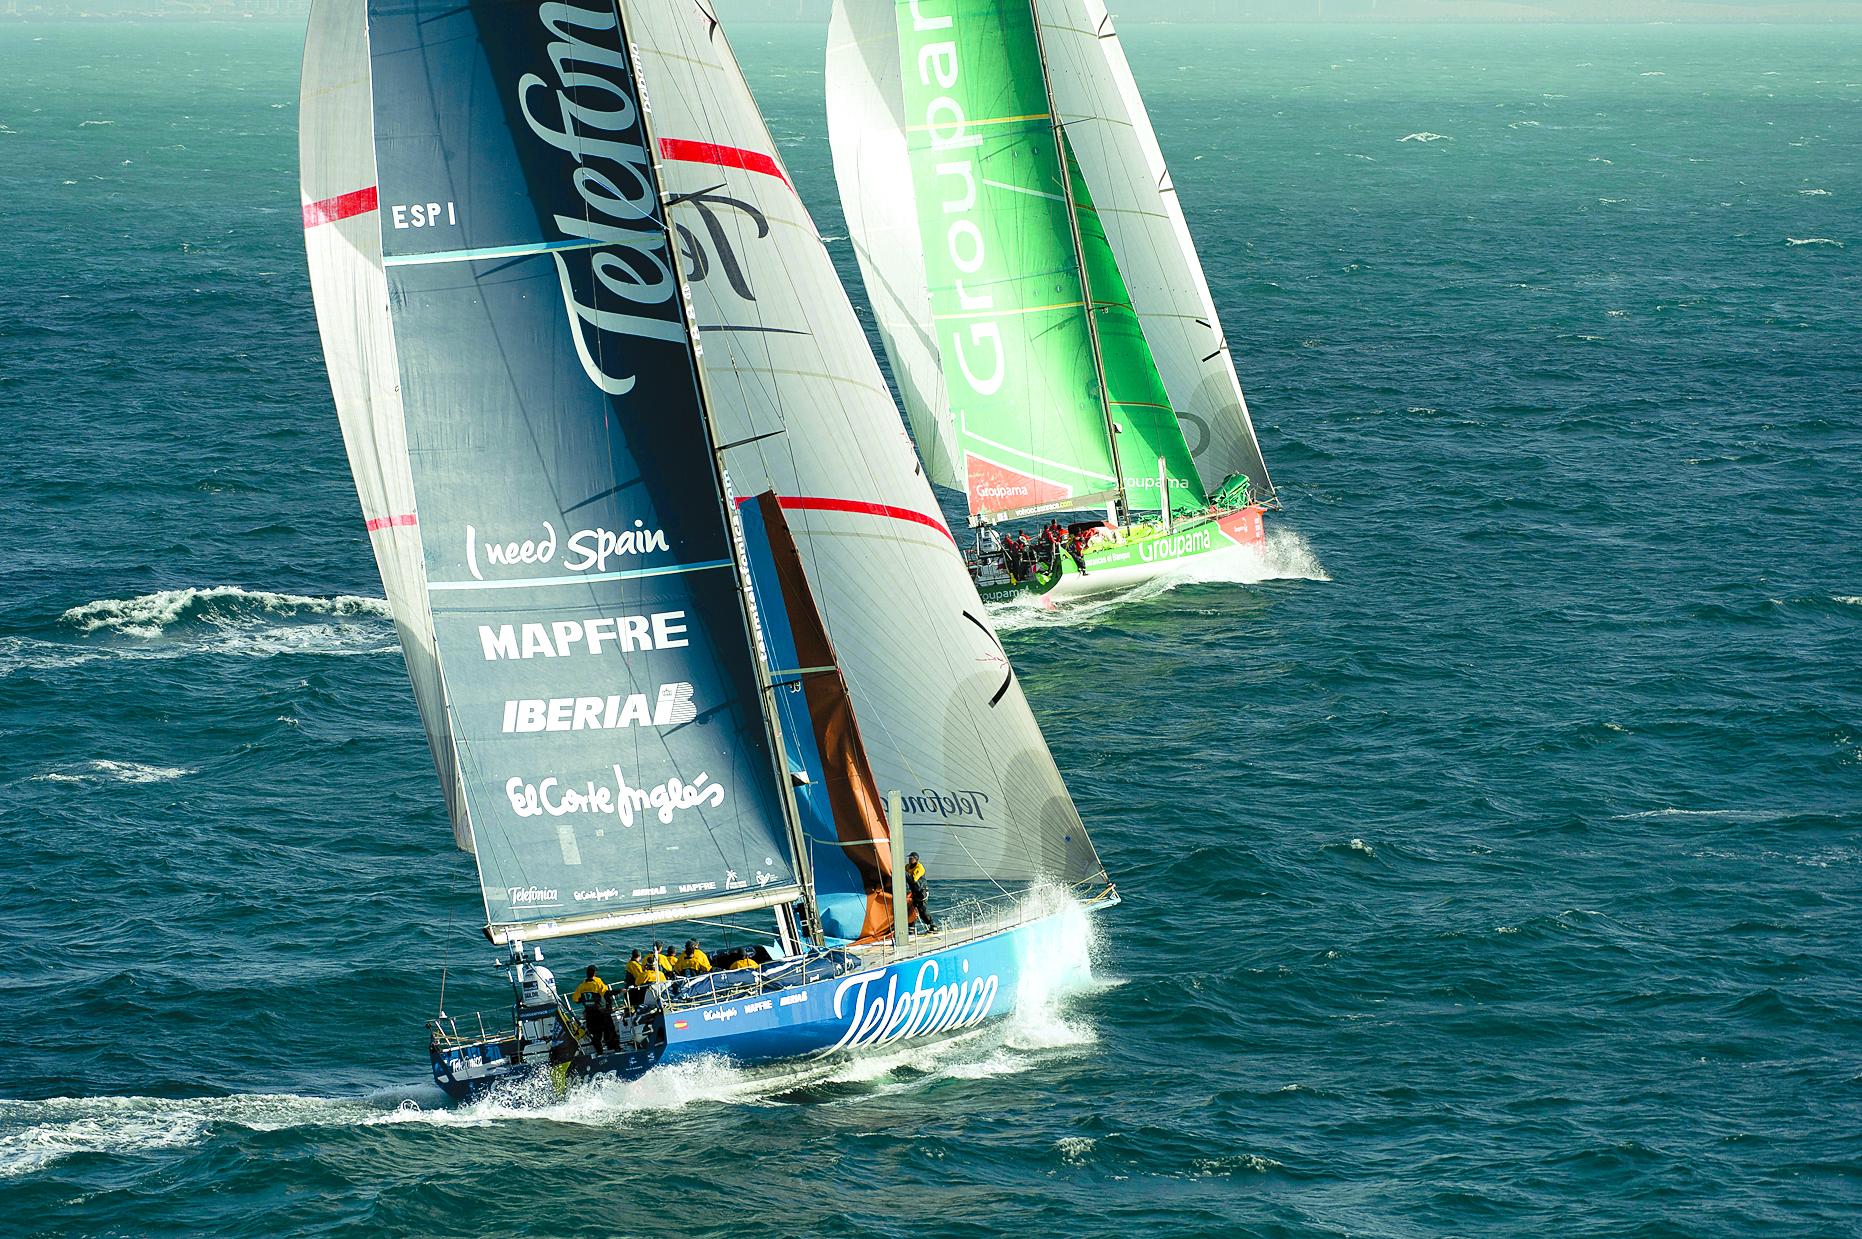 Groupama Wins Second- Leg Sprint in Volvo Ocean Race